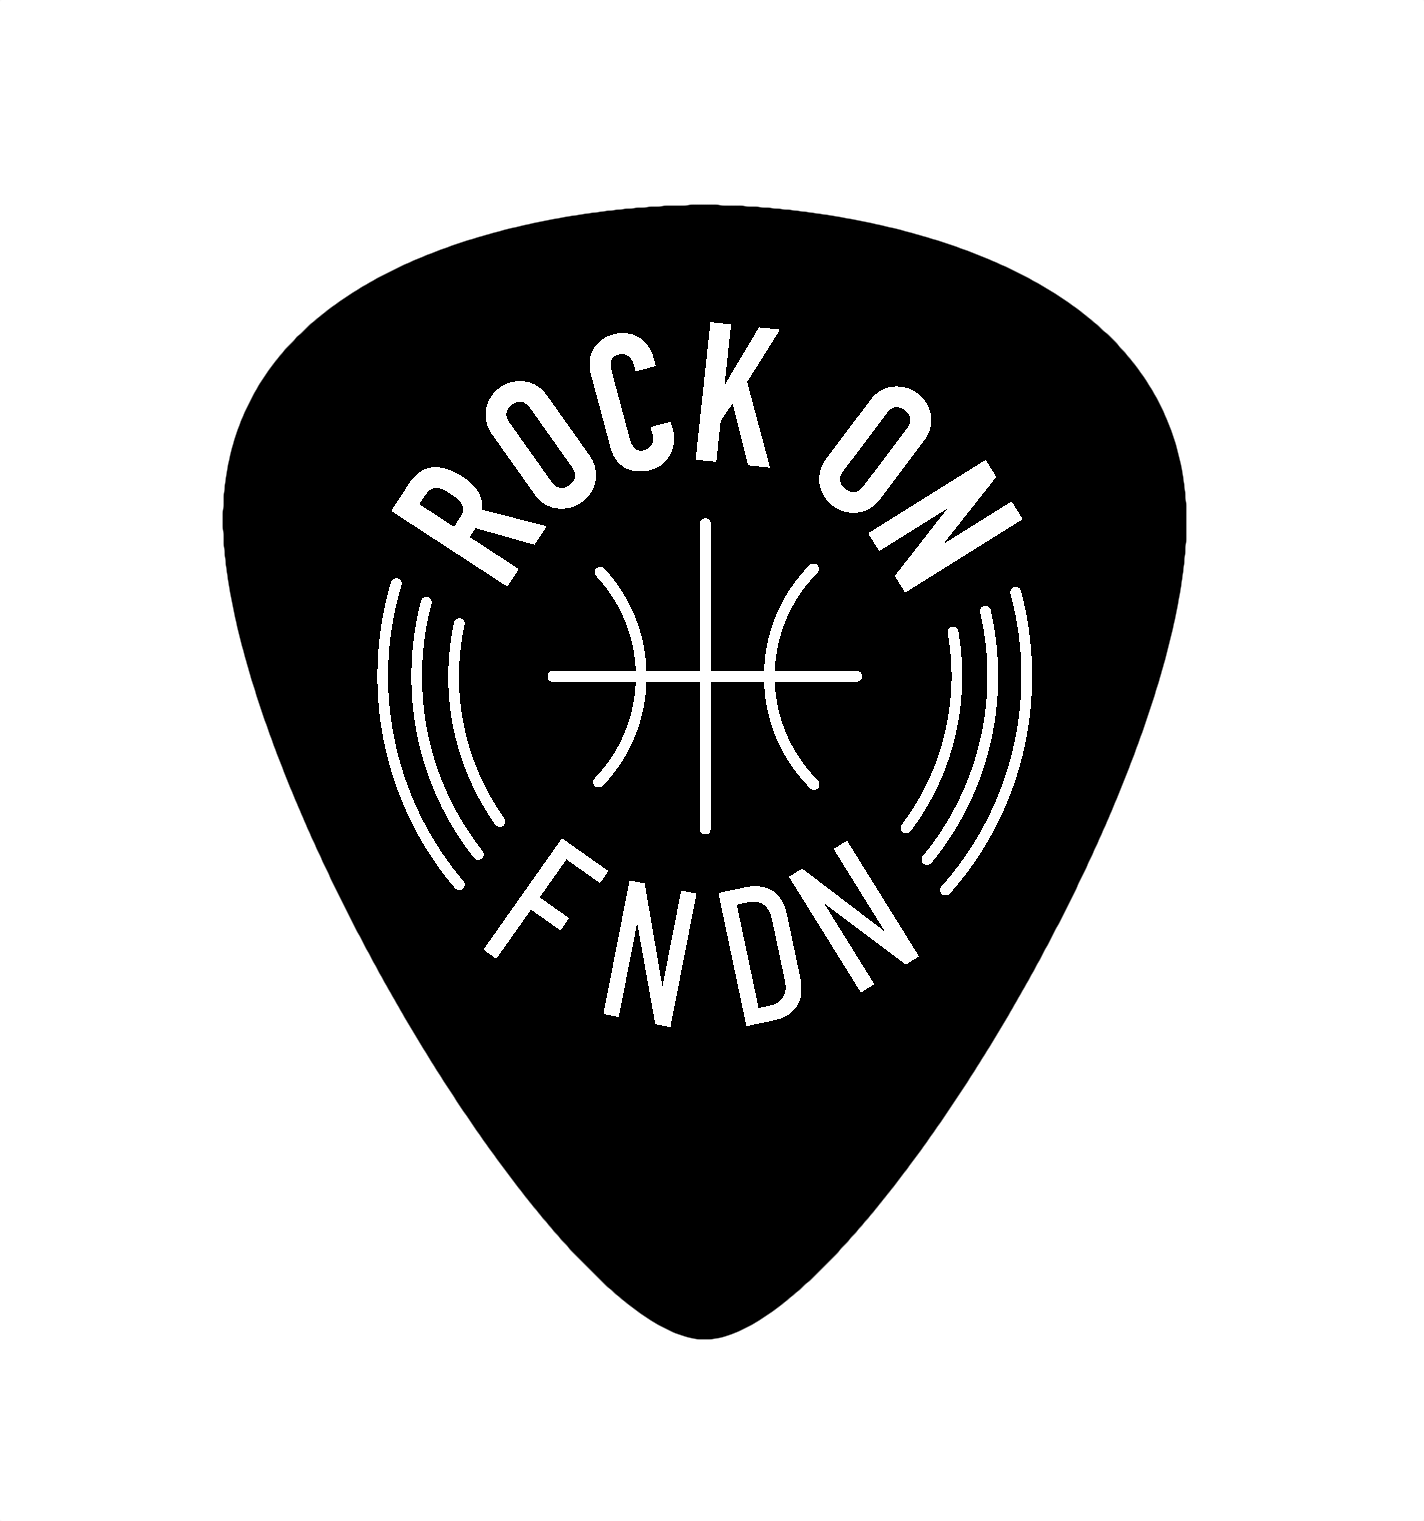 Rock-On-FNDN-Logo-2018 copy 2_Page_1.png